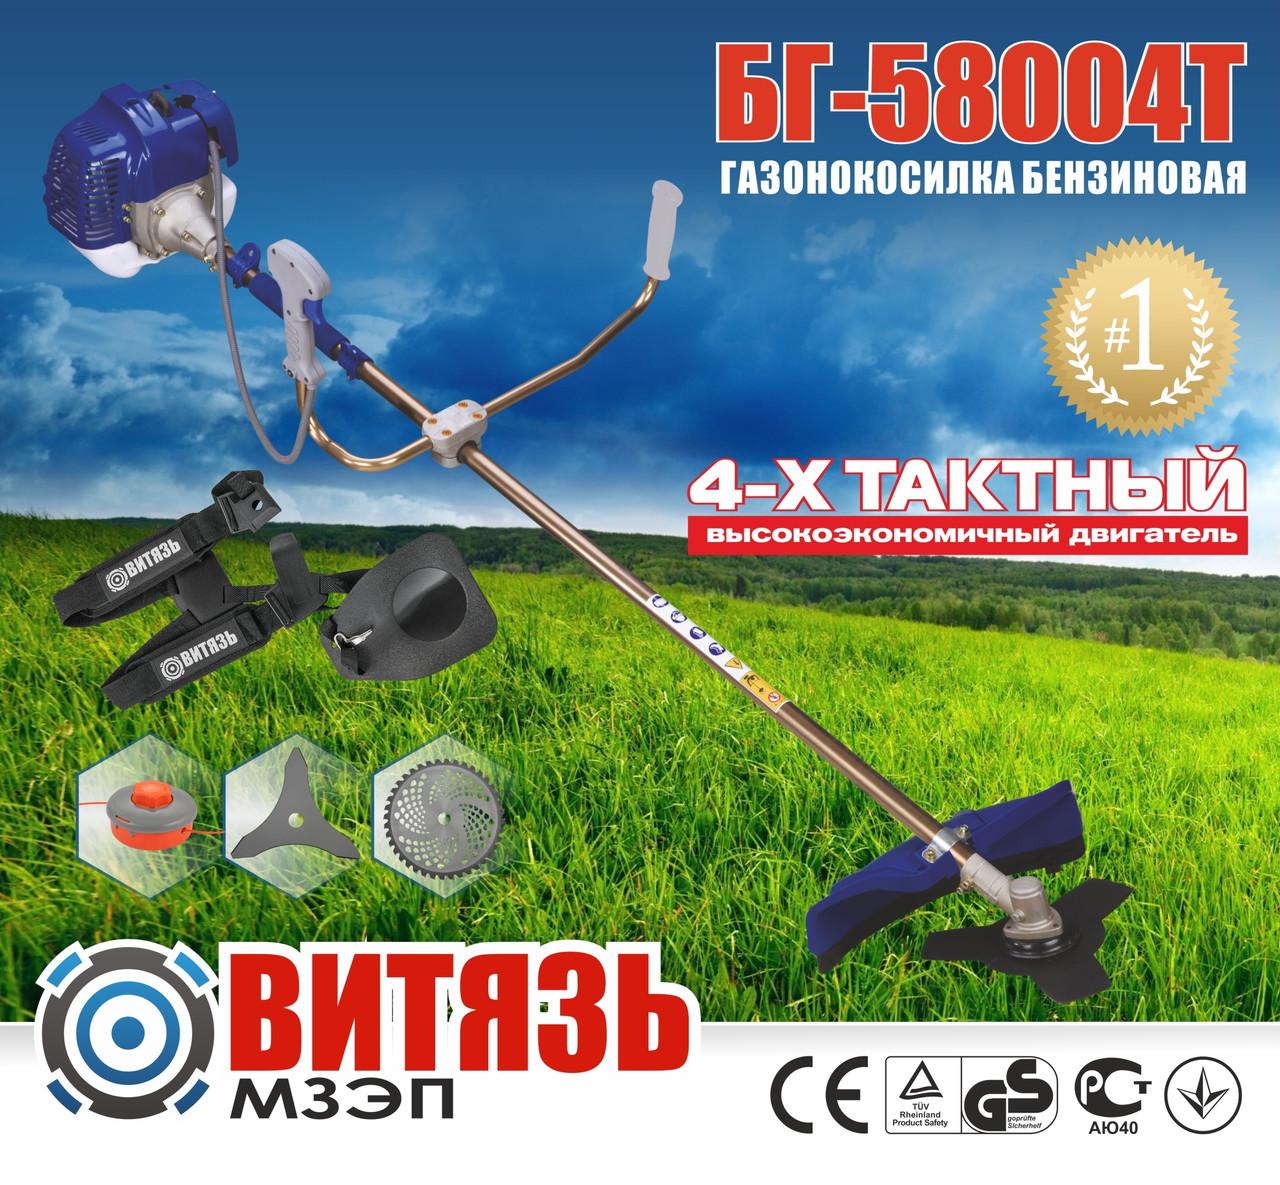 Бензокоса Витязь БГ-5800 4Т (4-х тактный двигатель) + набор ножей